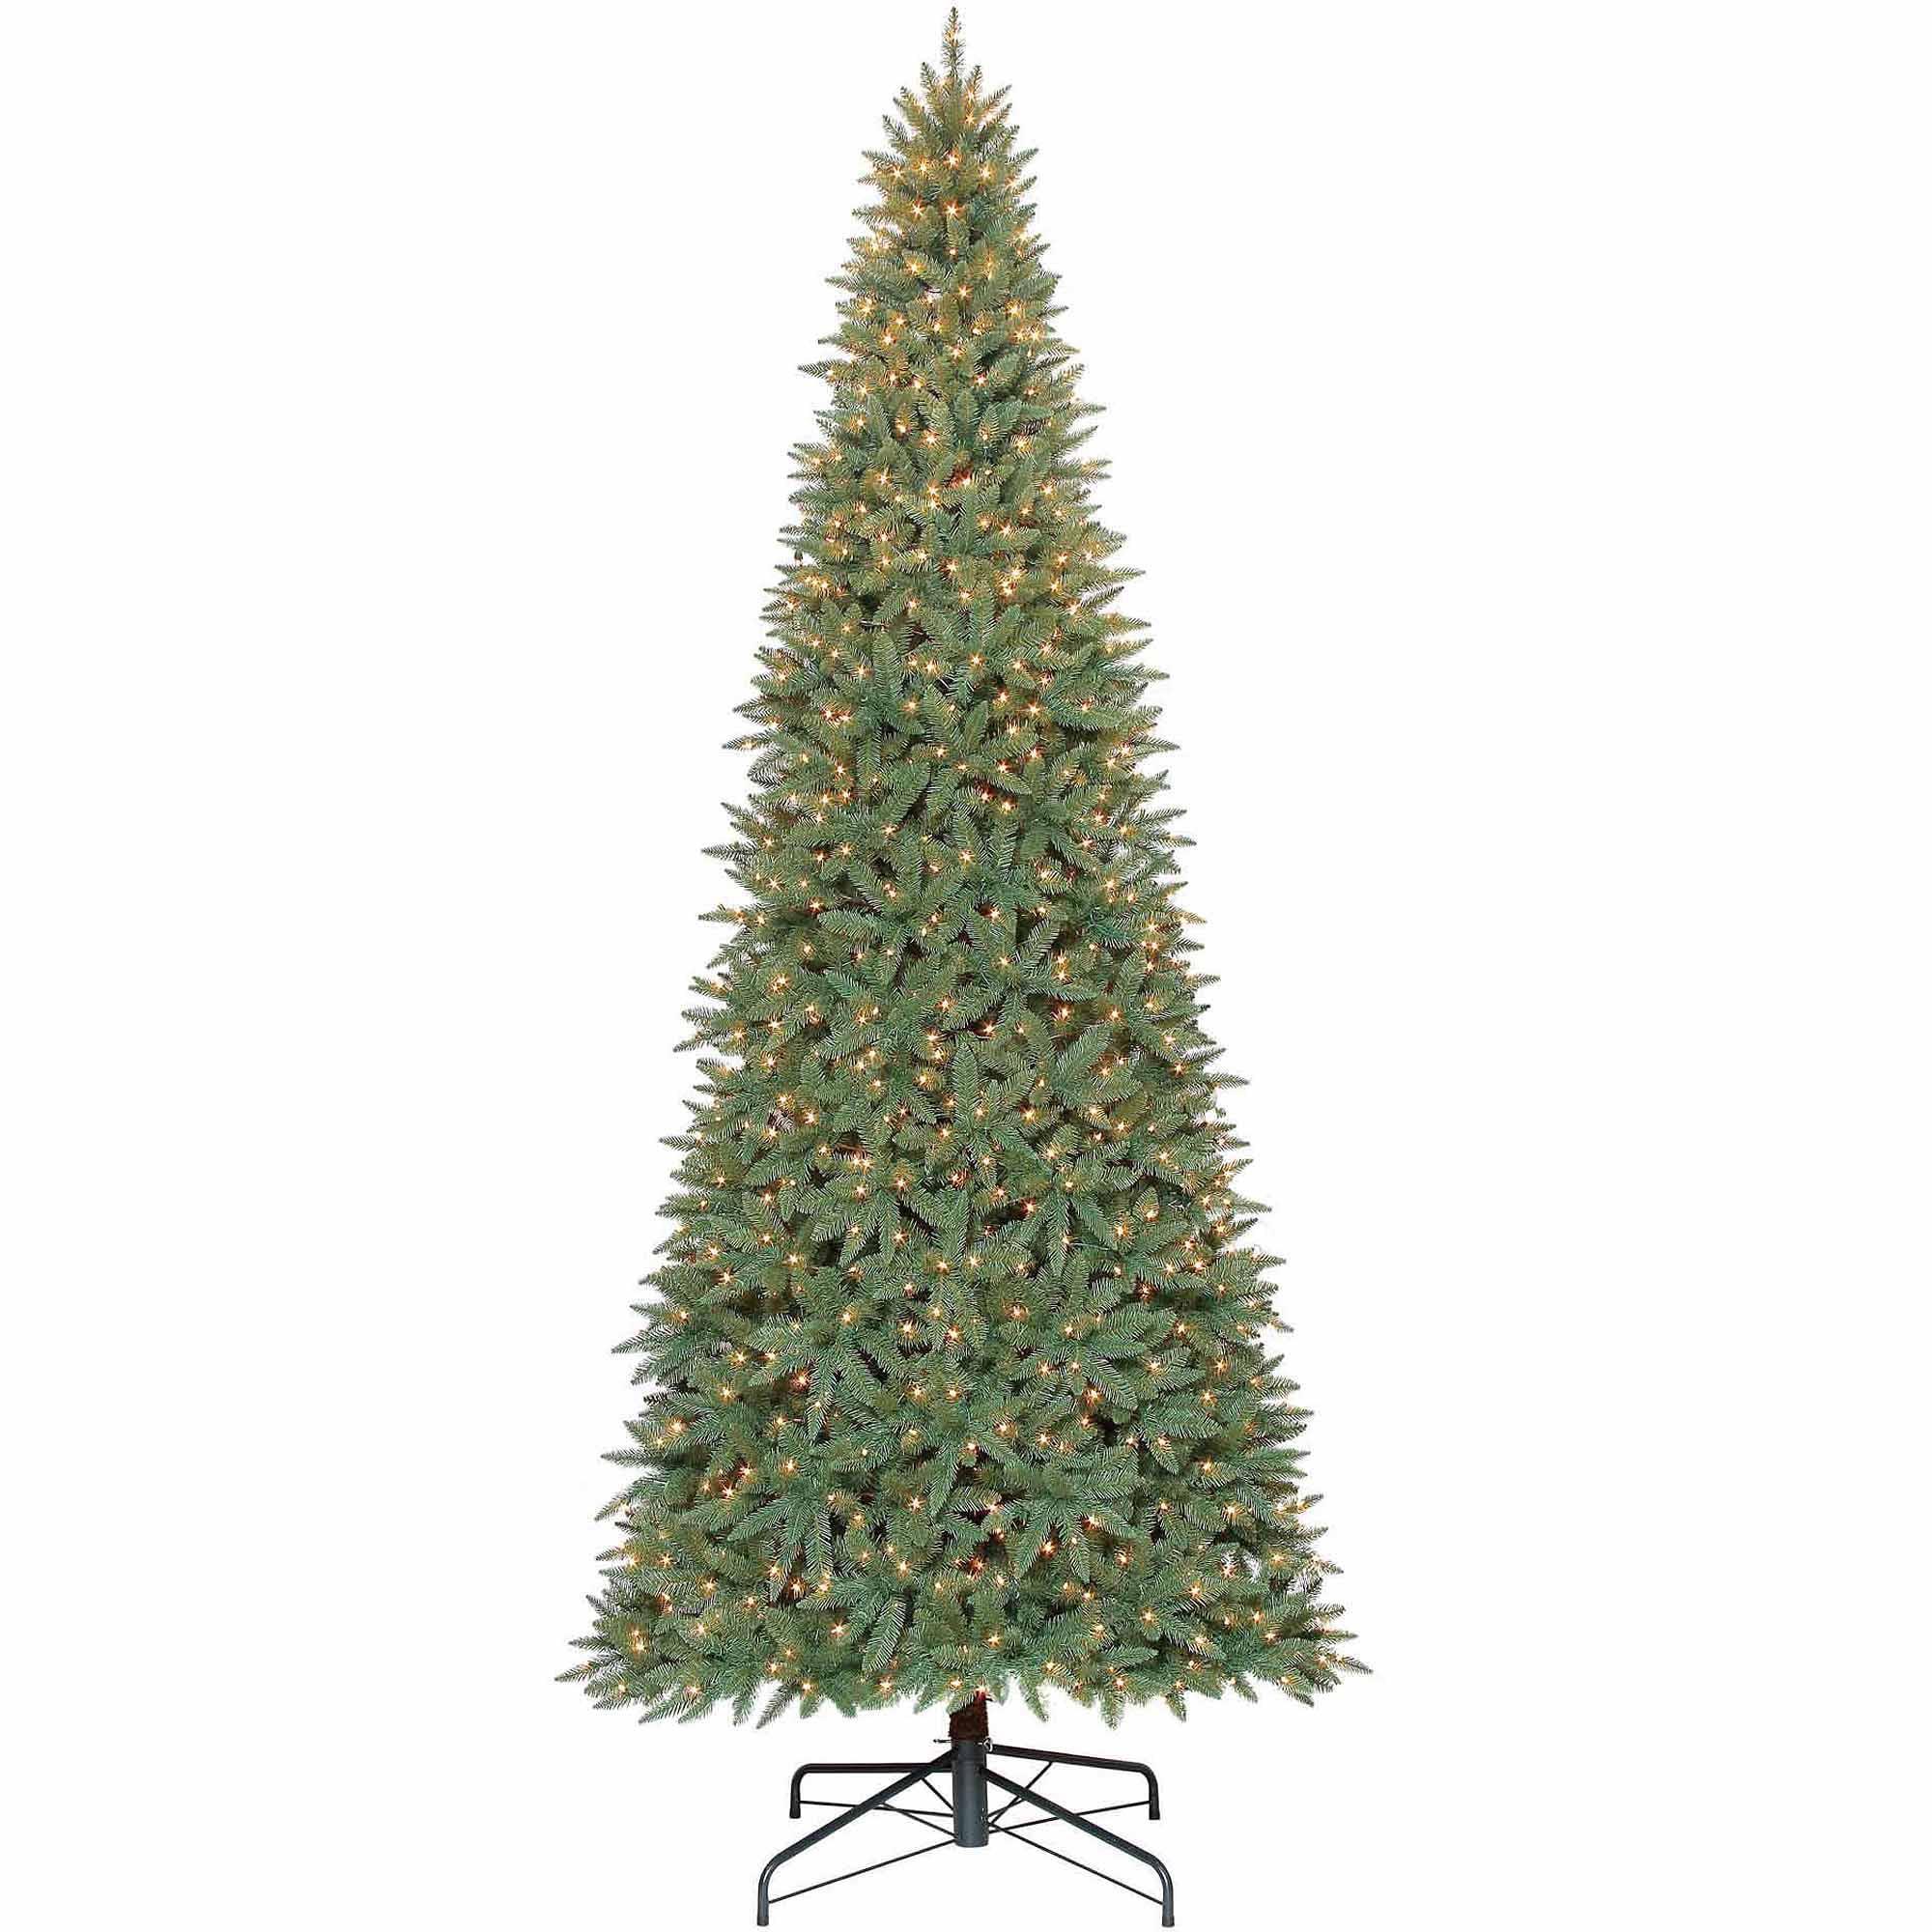 Holiday Time 12ft Williams Slim Pe/pvc Quick Set Tree - Walmart.com